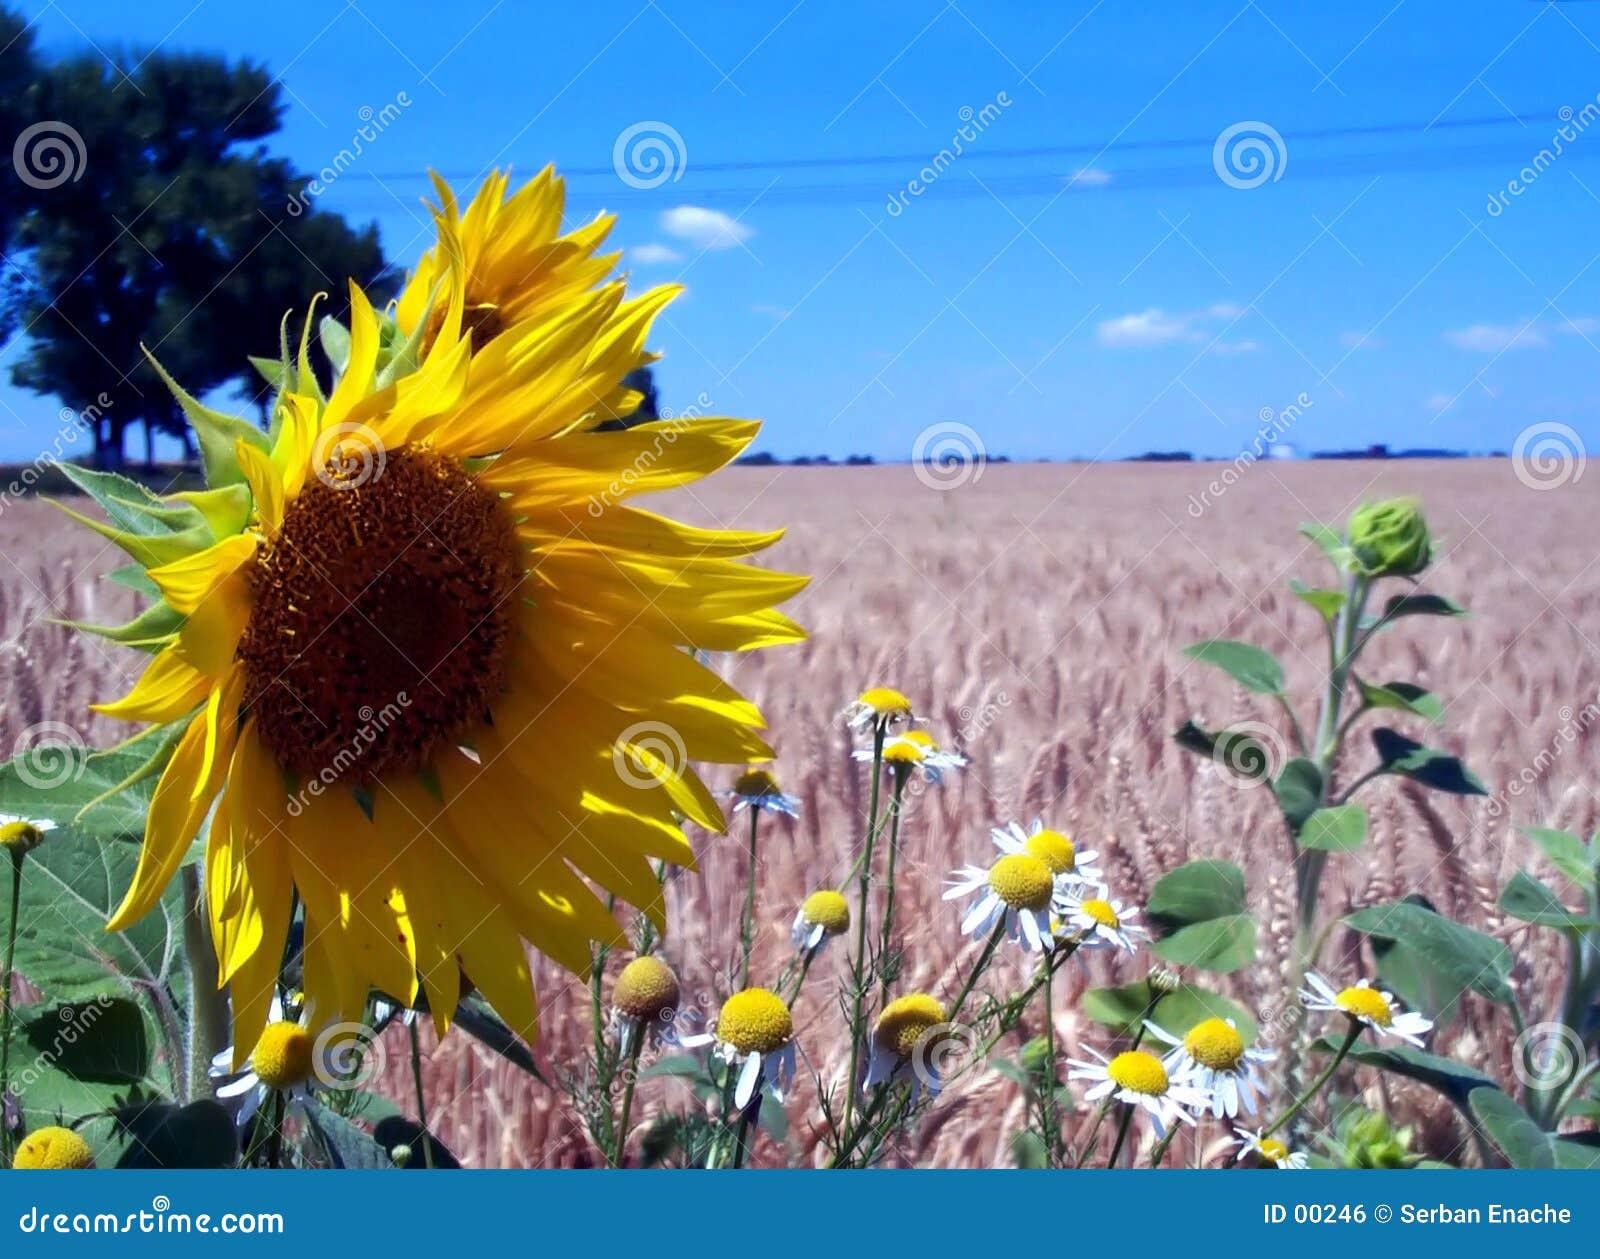 Blue sky, sunflower and wheat fields